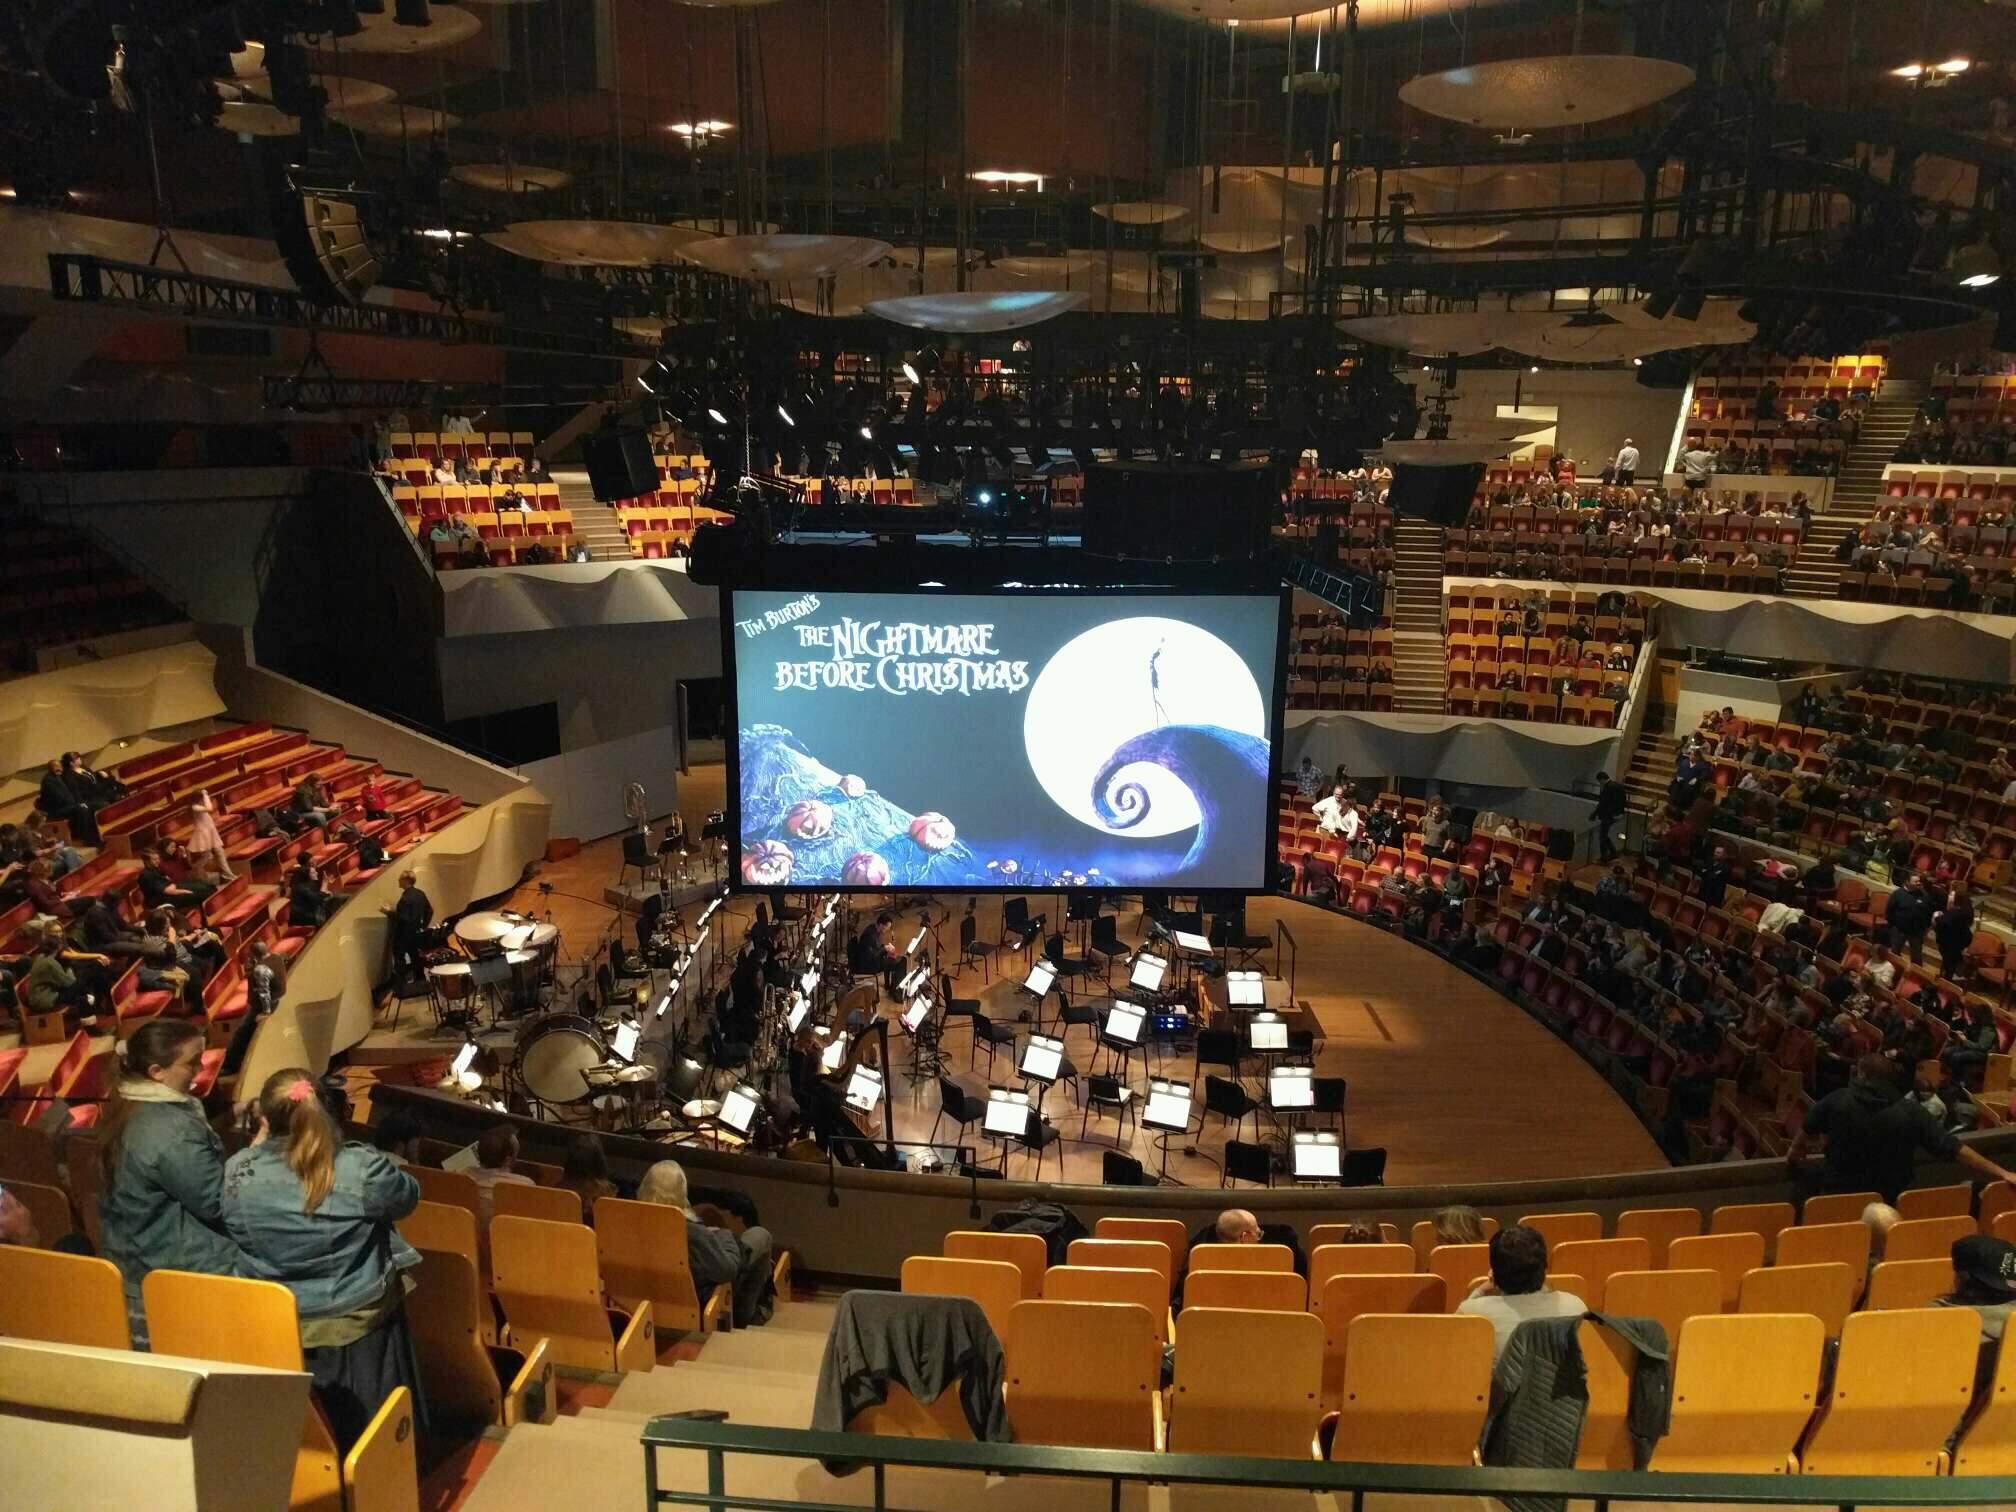 Boettcher Concert Hall Section Mezzanine 7 Row n Seat 32